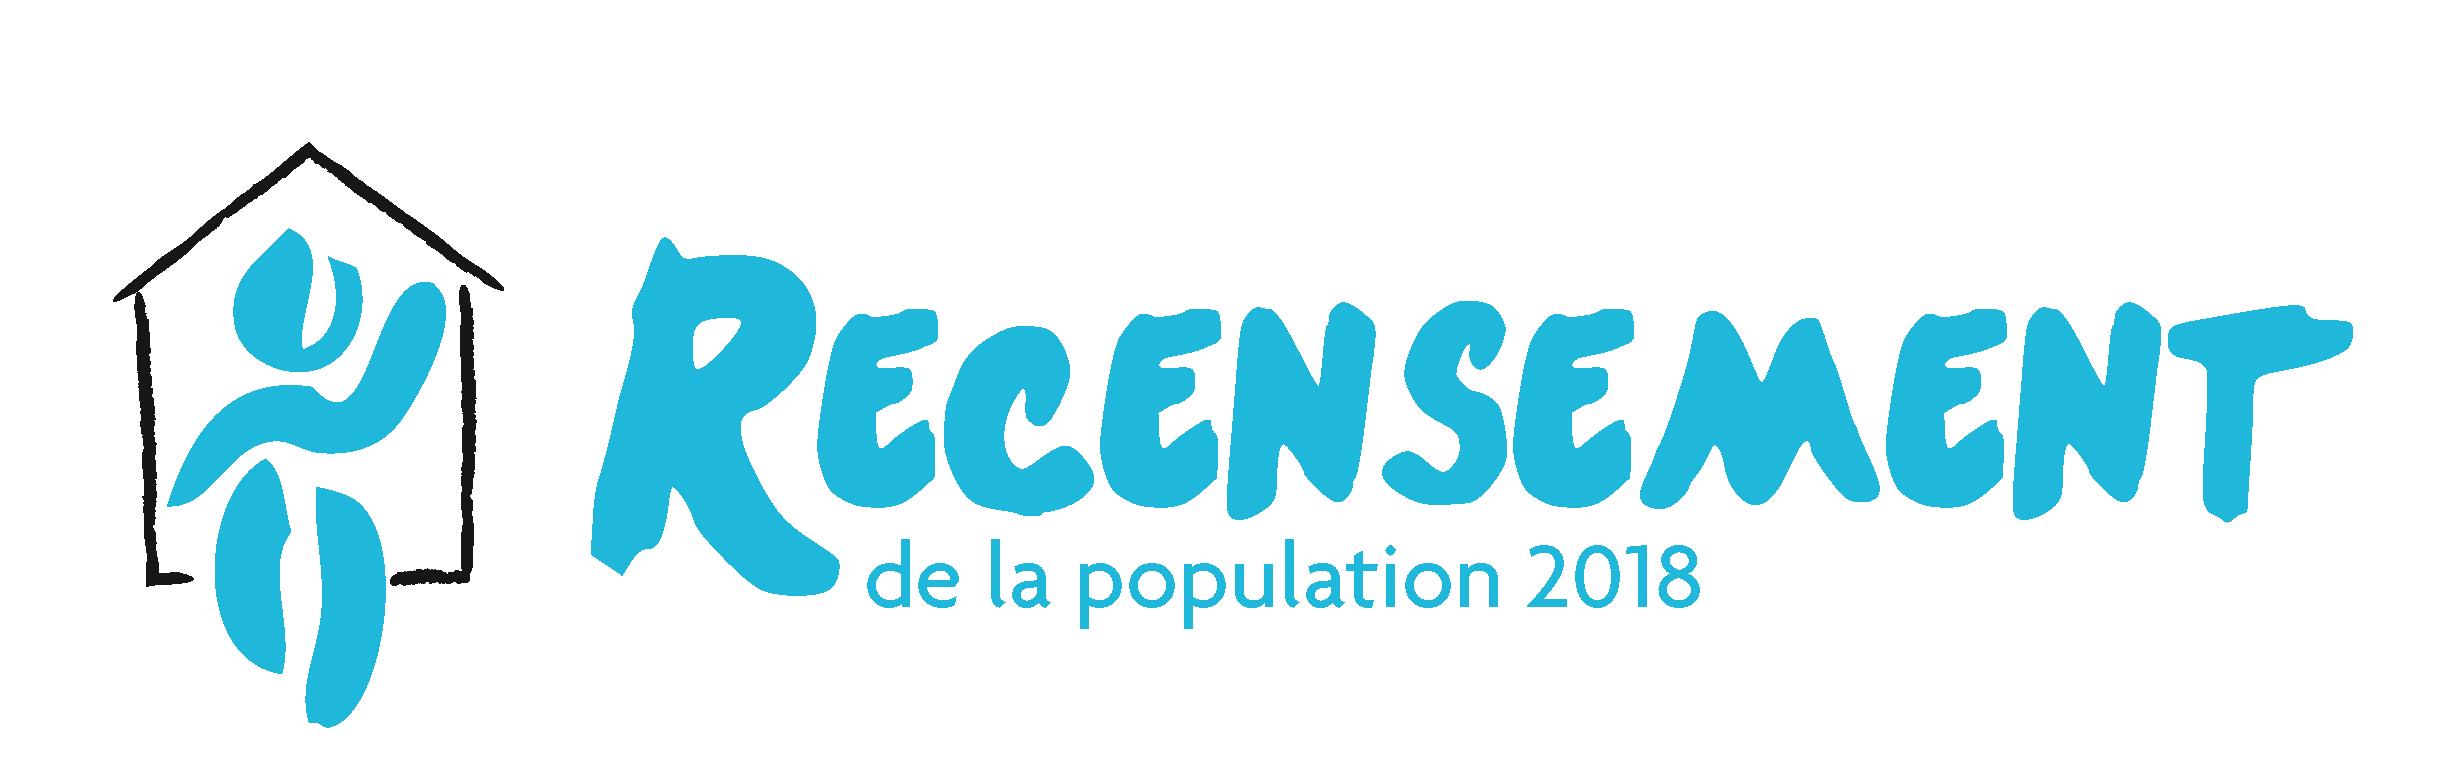 Recensement de la population 2018